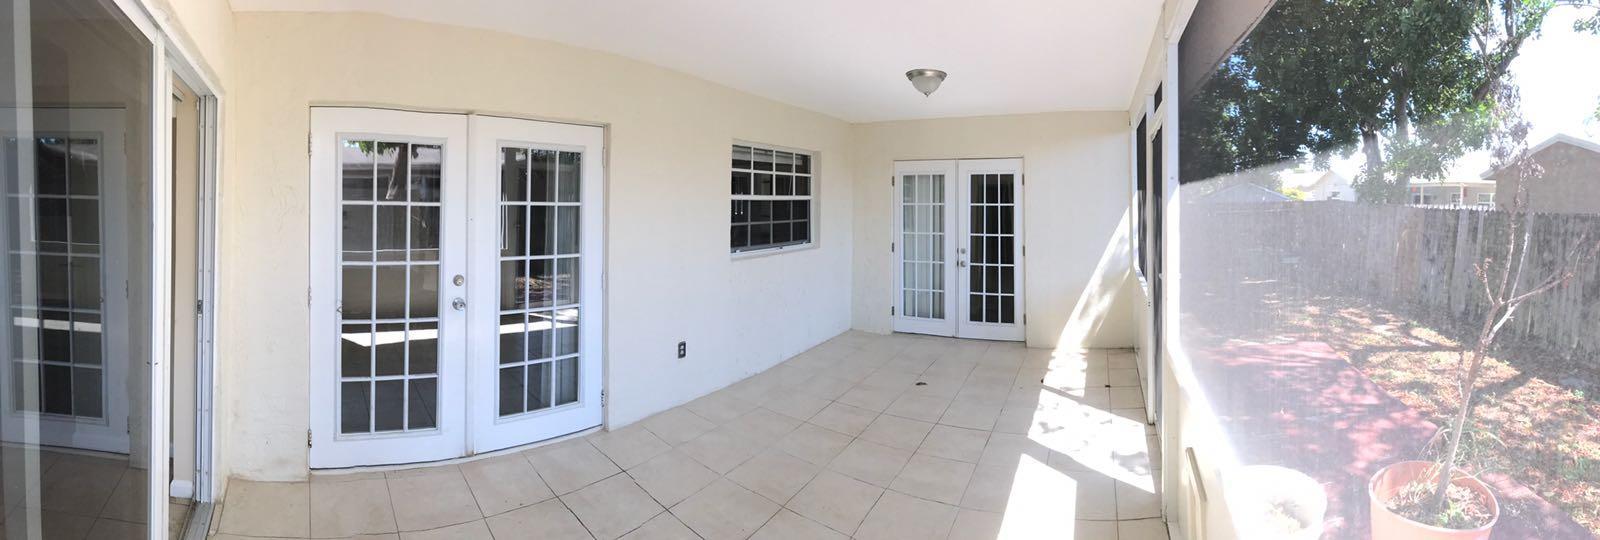 8952 SW 6th Street Boca Raton, FL 33433 photo 4